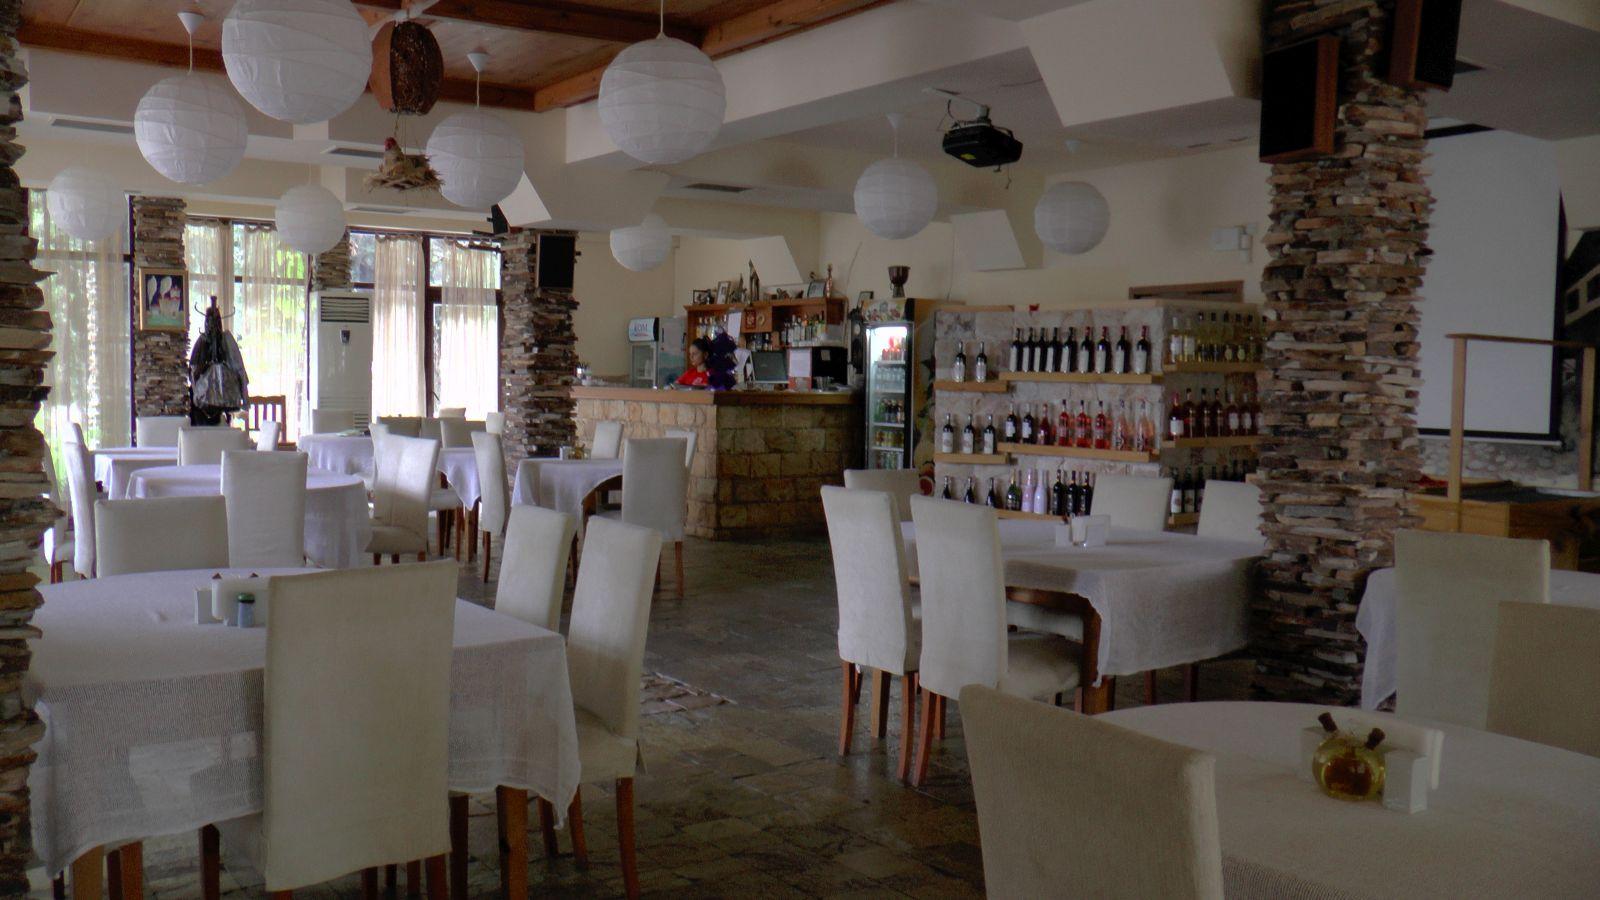 Ресторант Петрелийски с. Огняново - Традиционна, здравословна и веган кухня